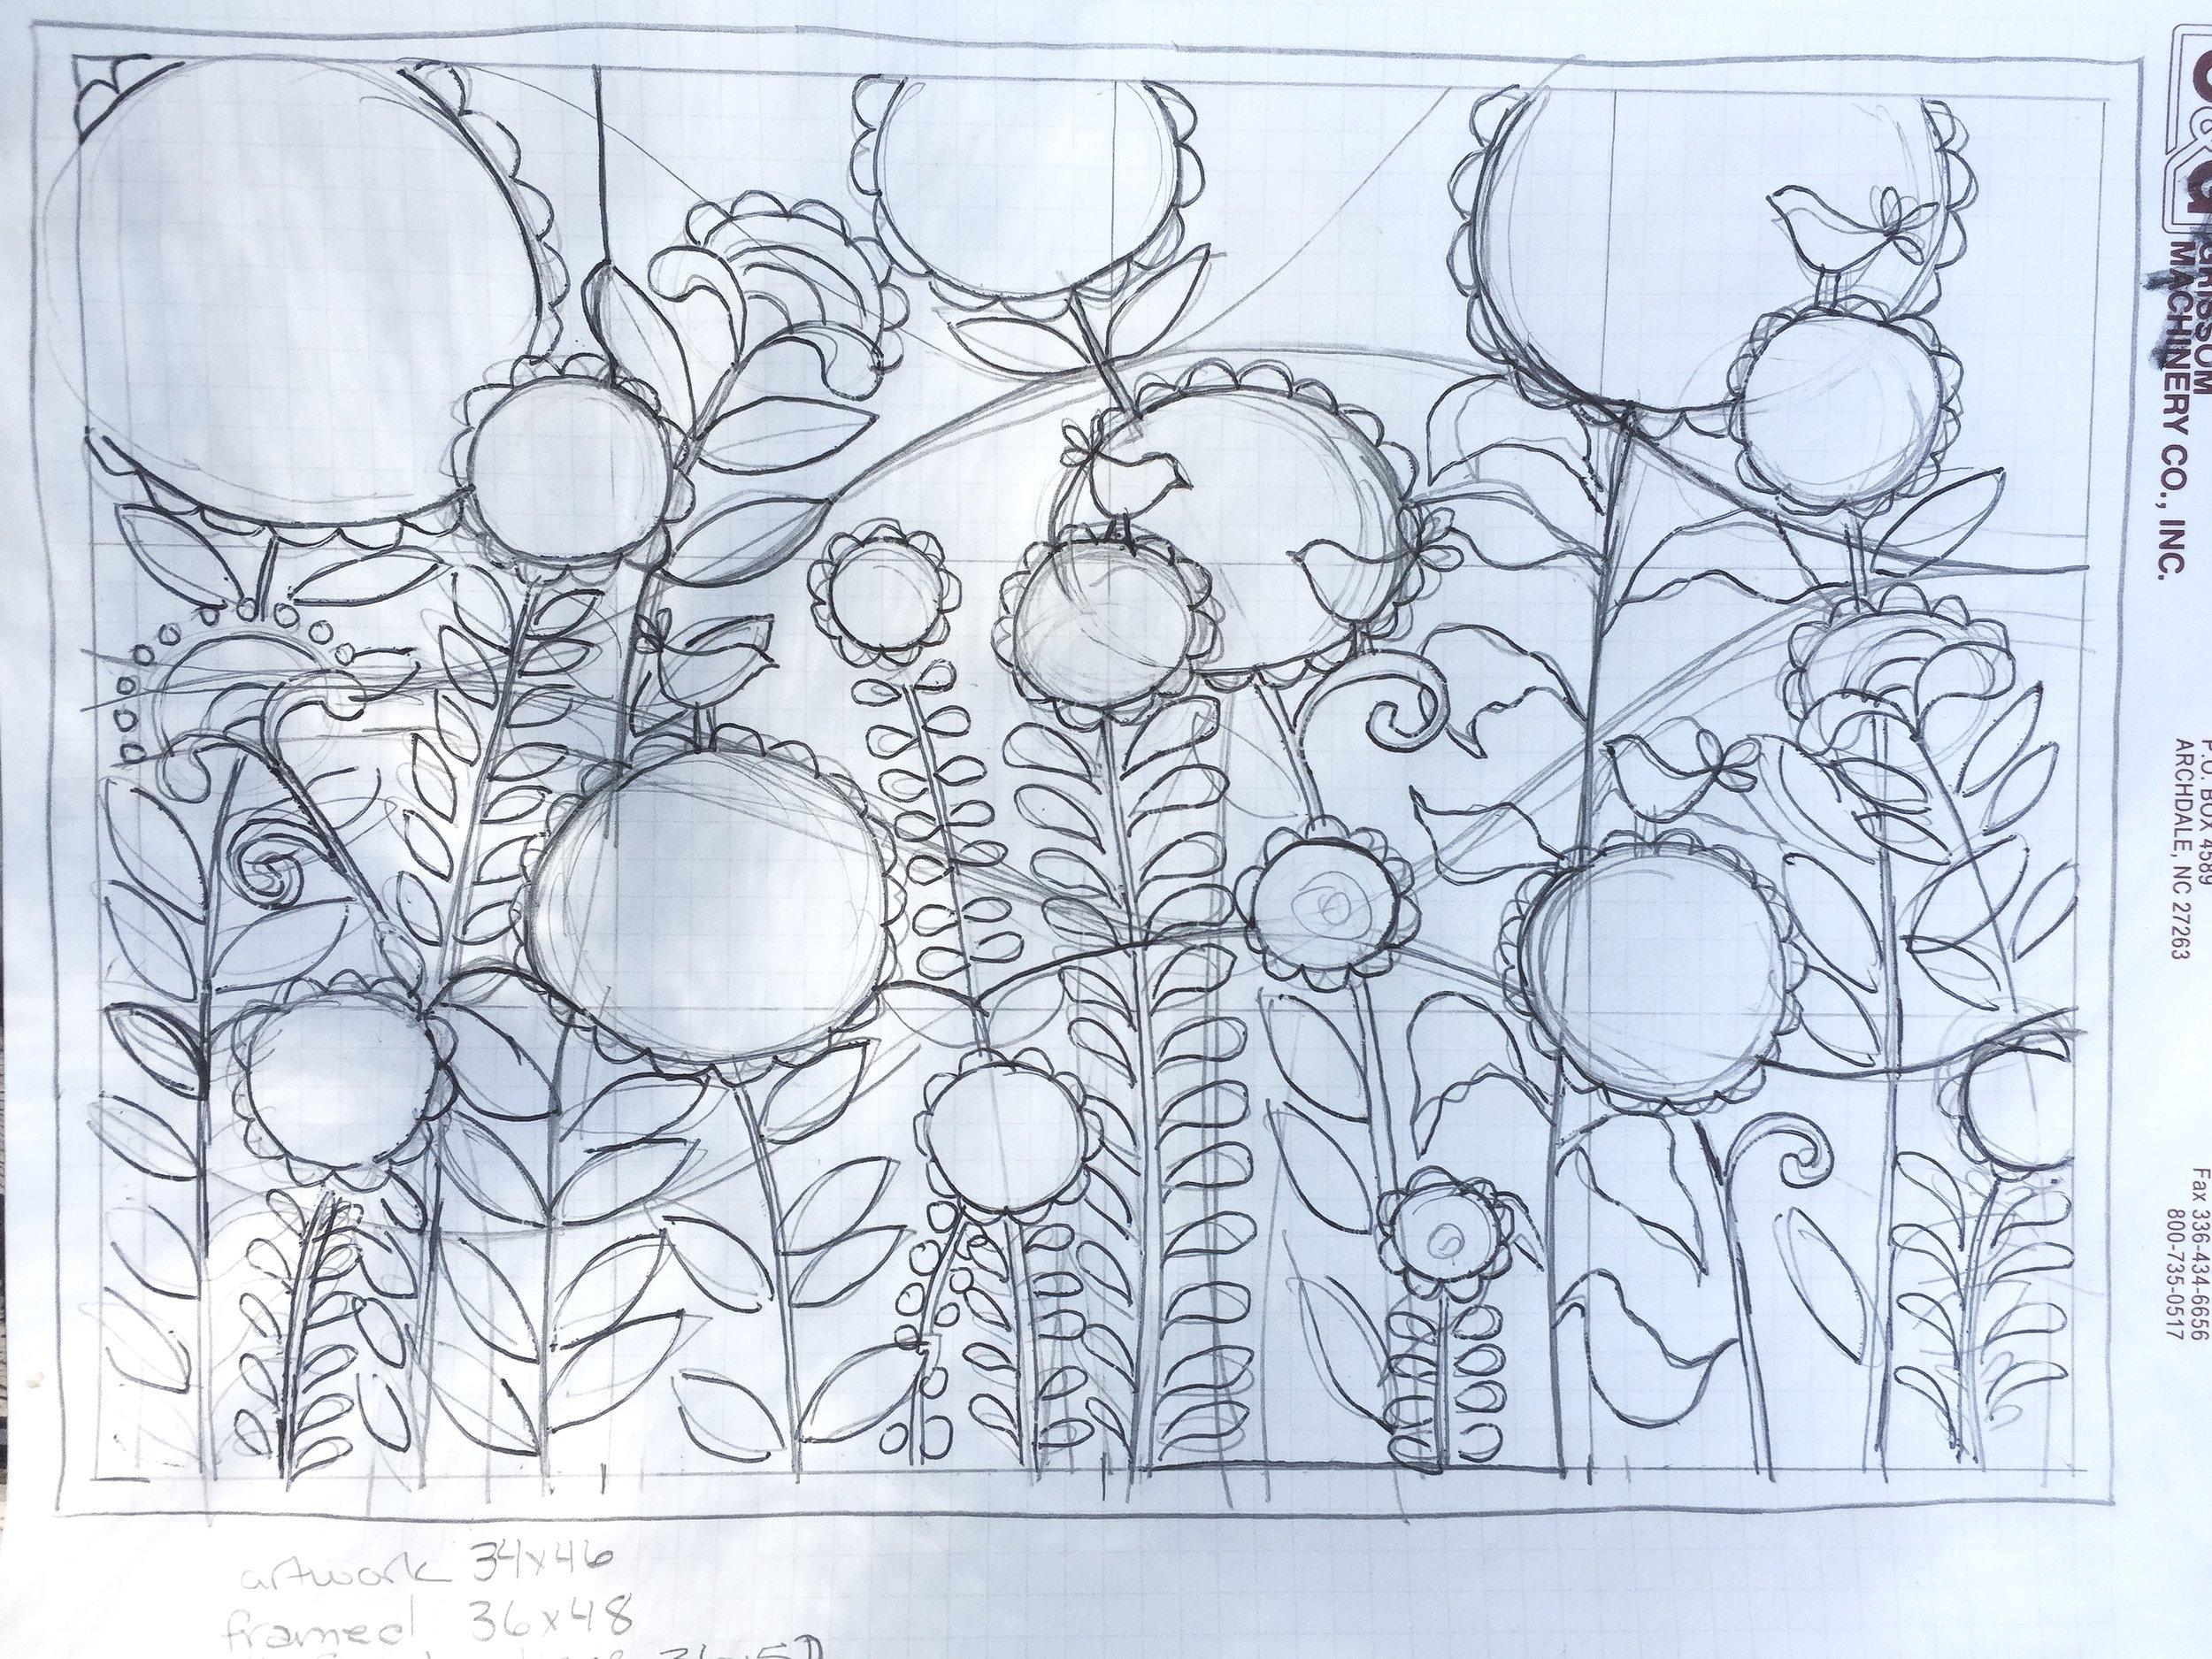 Matthew Roberts Phoenix AZ FINAL horizontal single piece 48 x 36.JPG